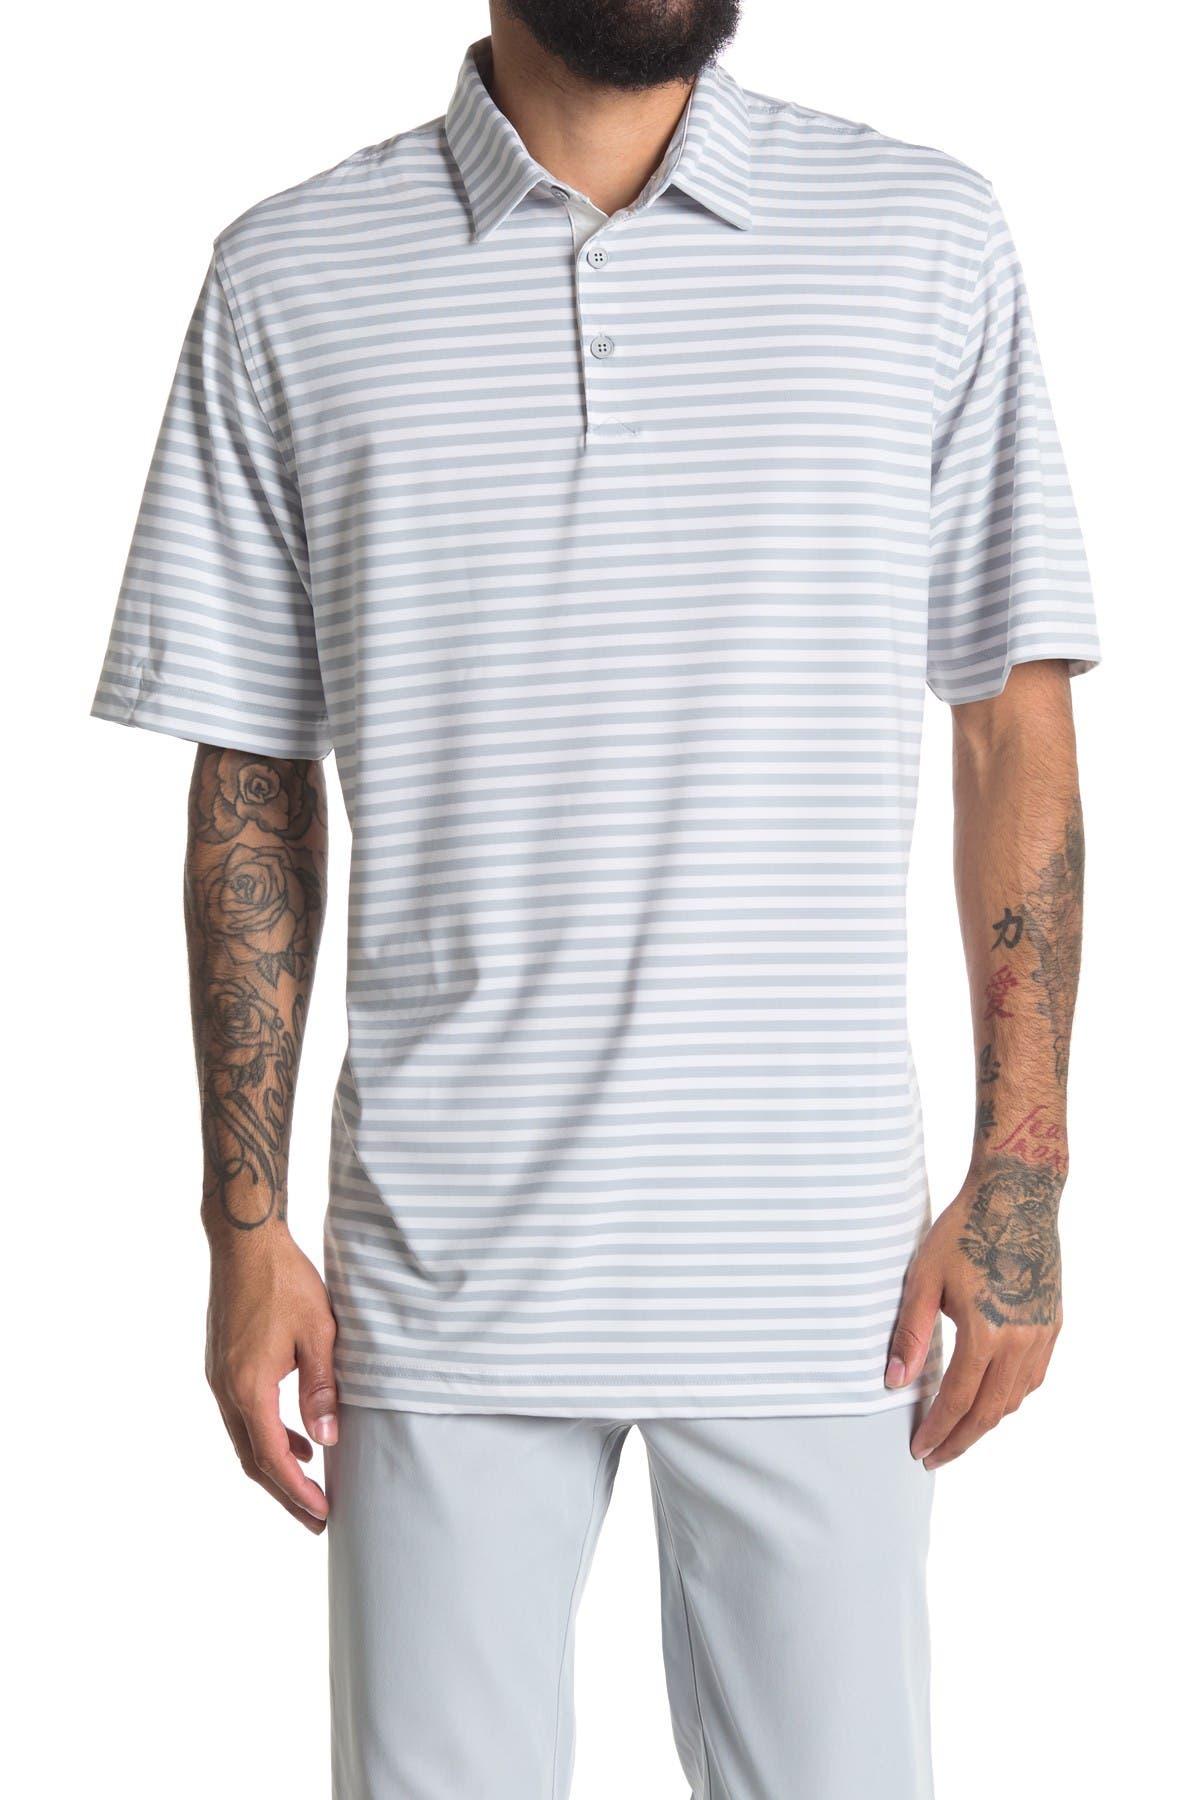 Image of Adidas Golf Adipure Essential Stripe Polo Shirt